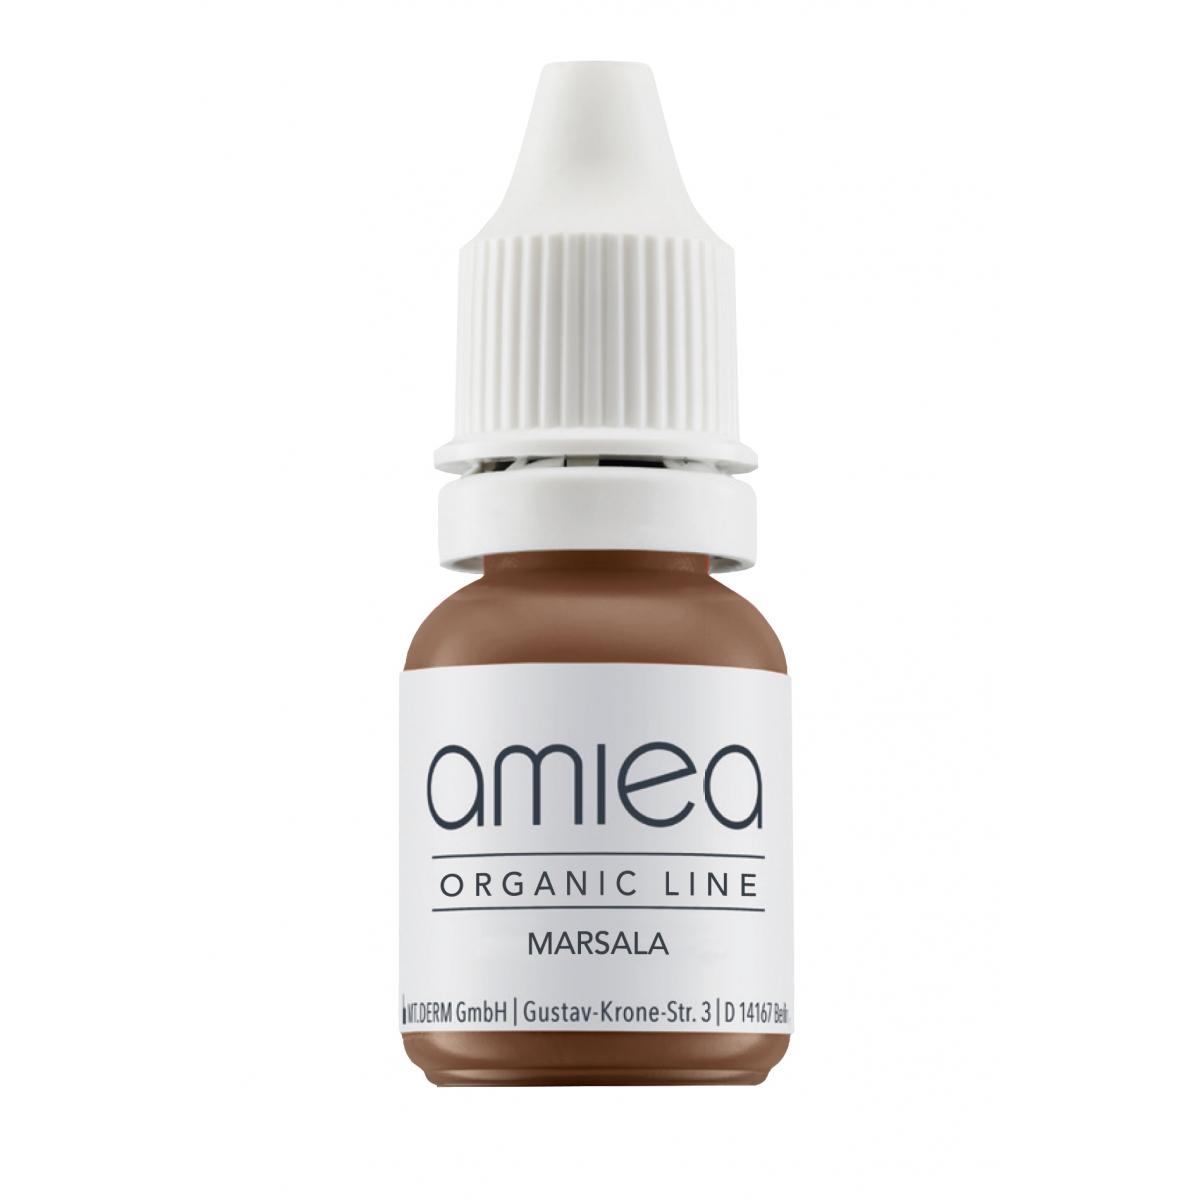 ORGANIC LINE (5ml)  - PIGMENT MARSALA ORGANICLINE AMIEA (5 ml)